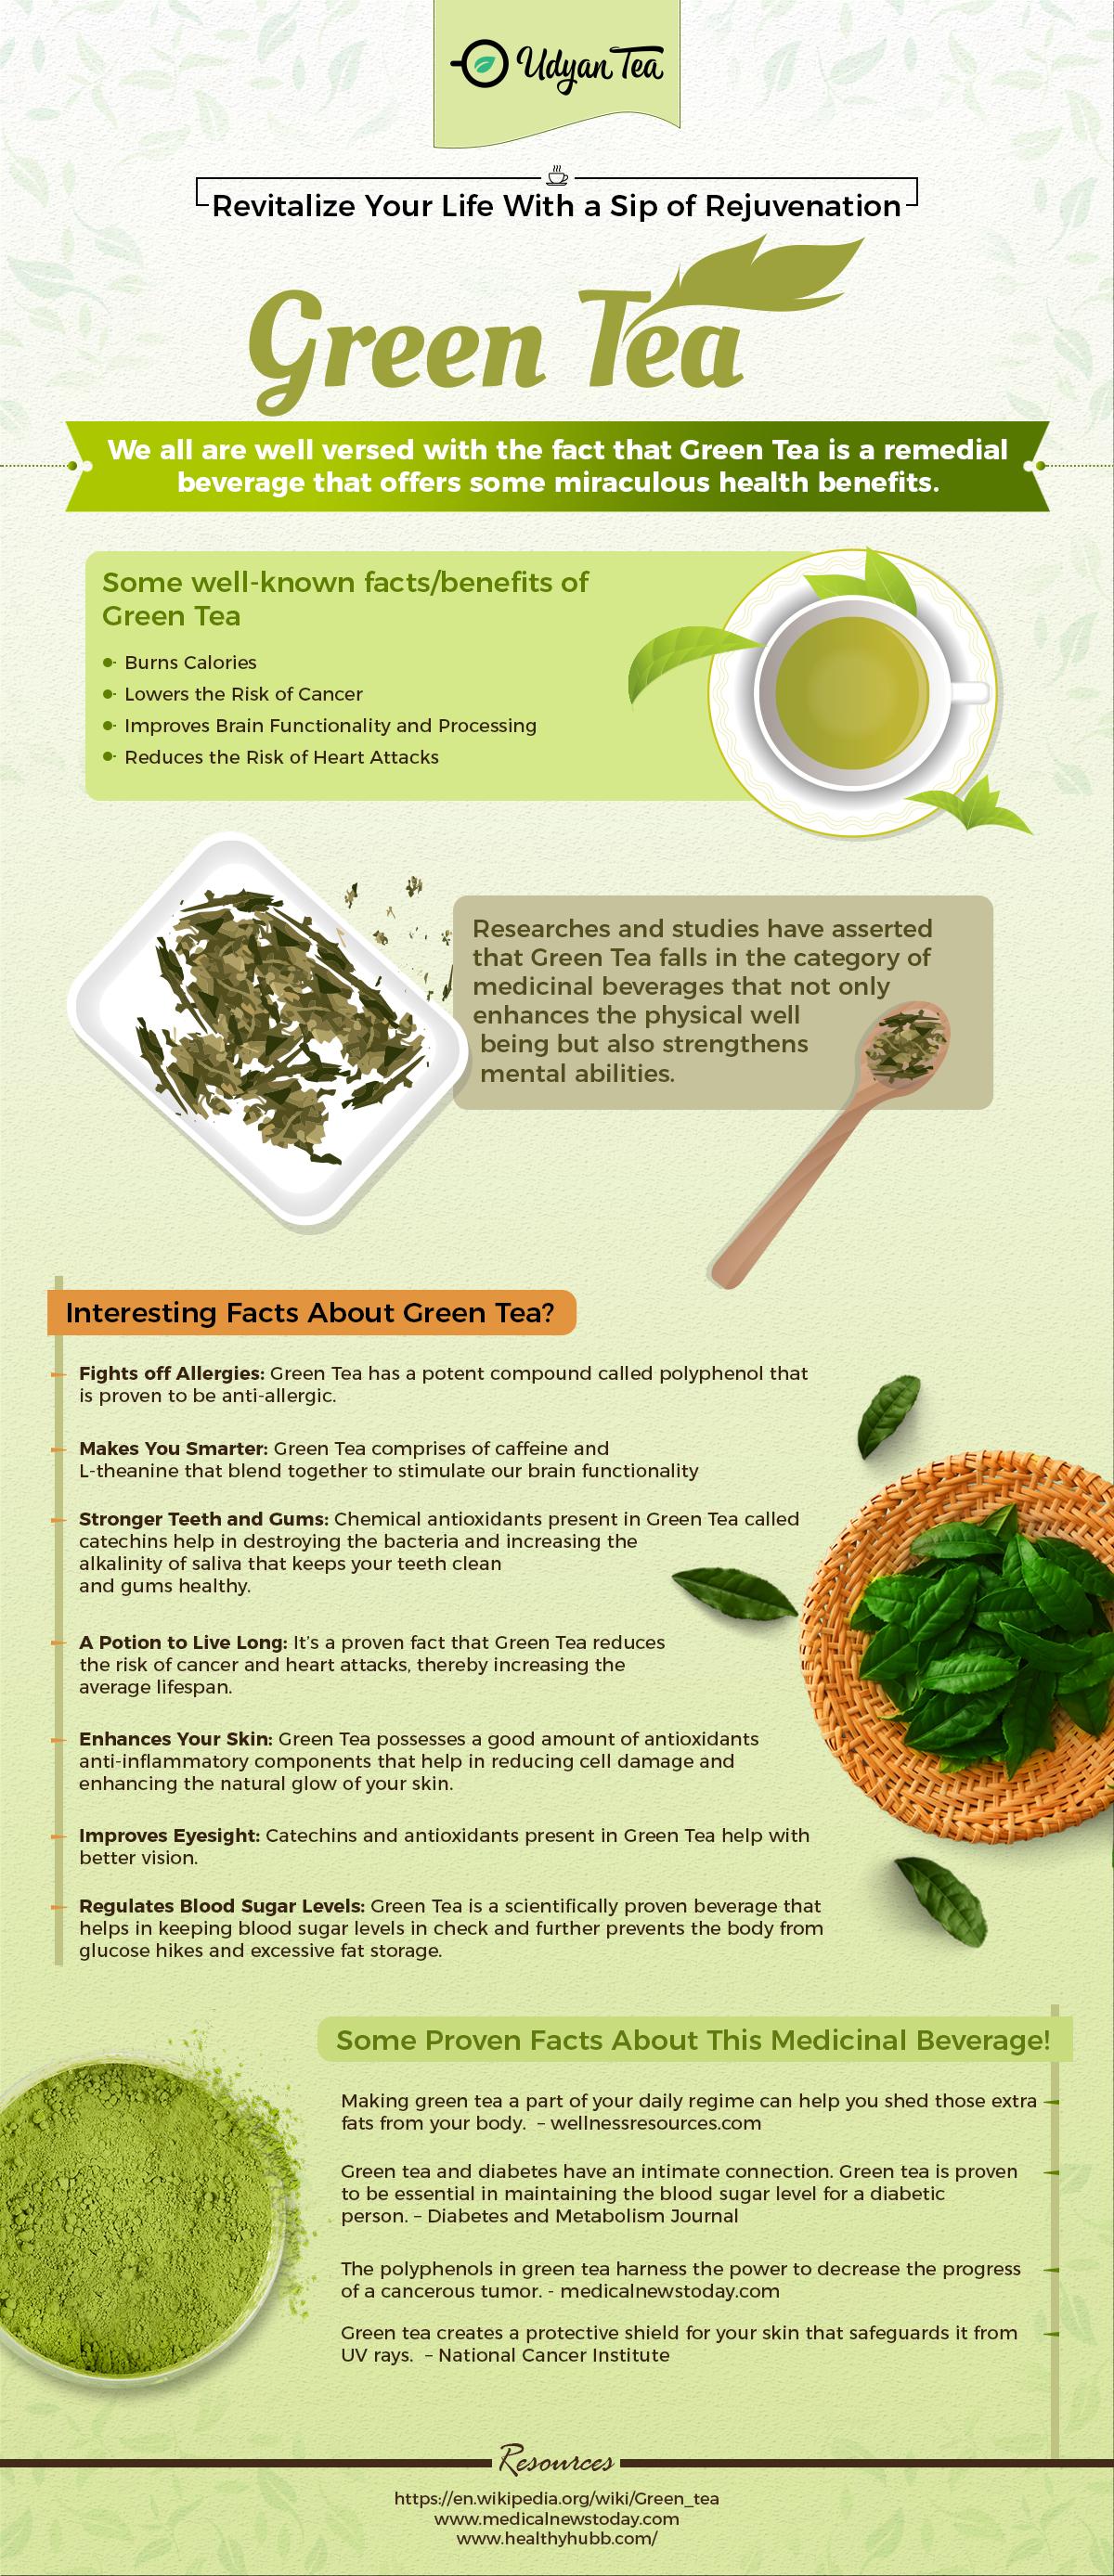 All About Green Tea - SocializeBlog